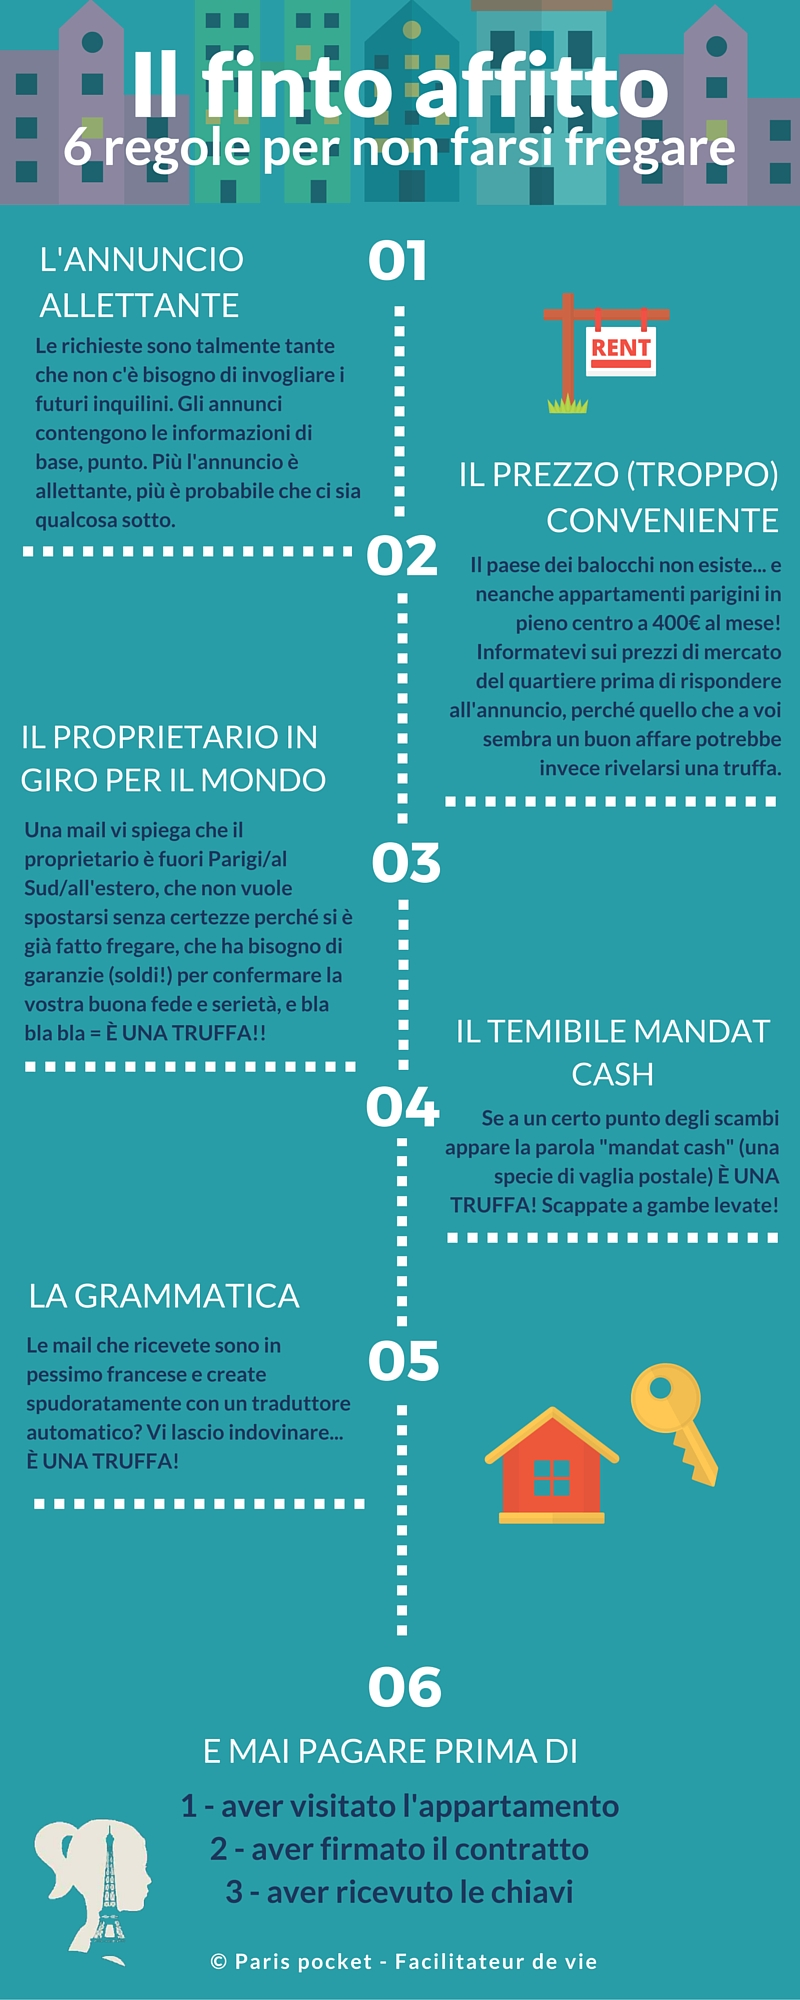 infografica_affitto